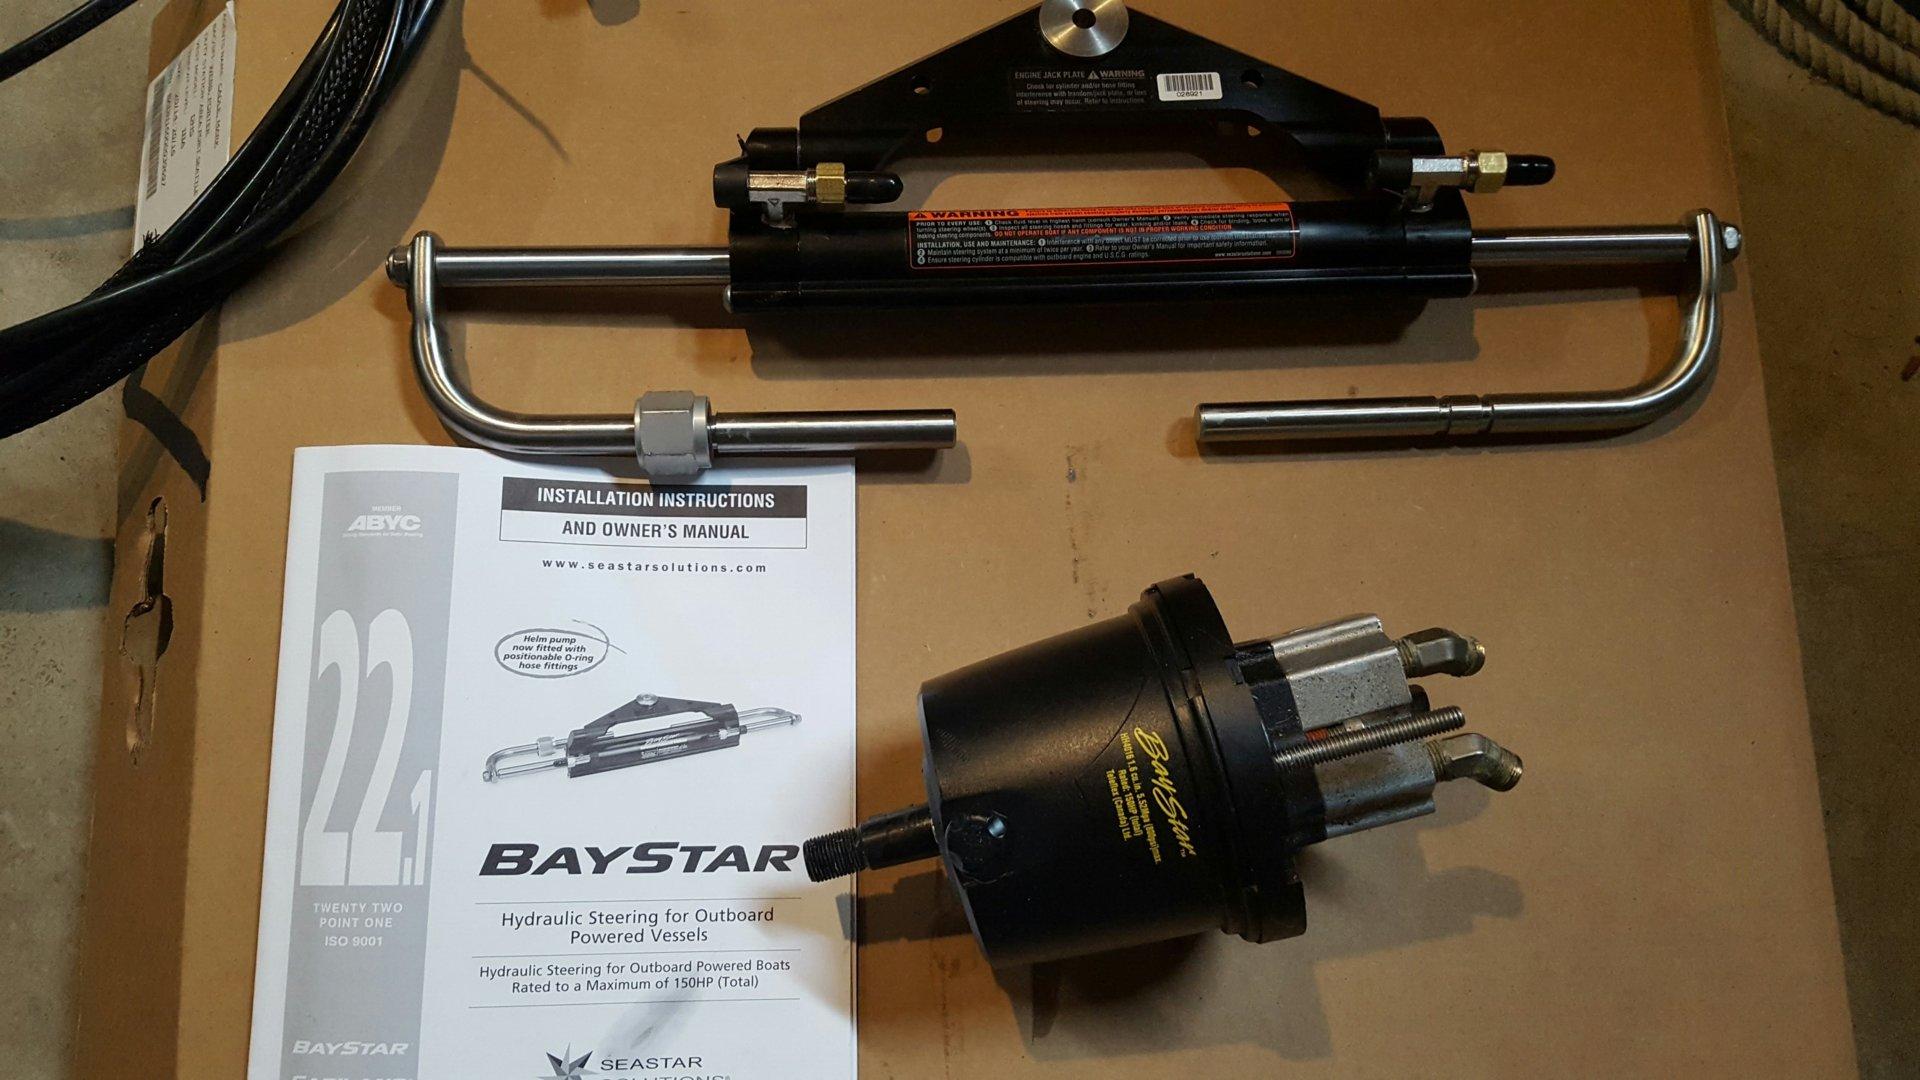 New Baystar Hydraulic steering cylinder, used pump and hoses